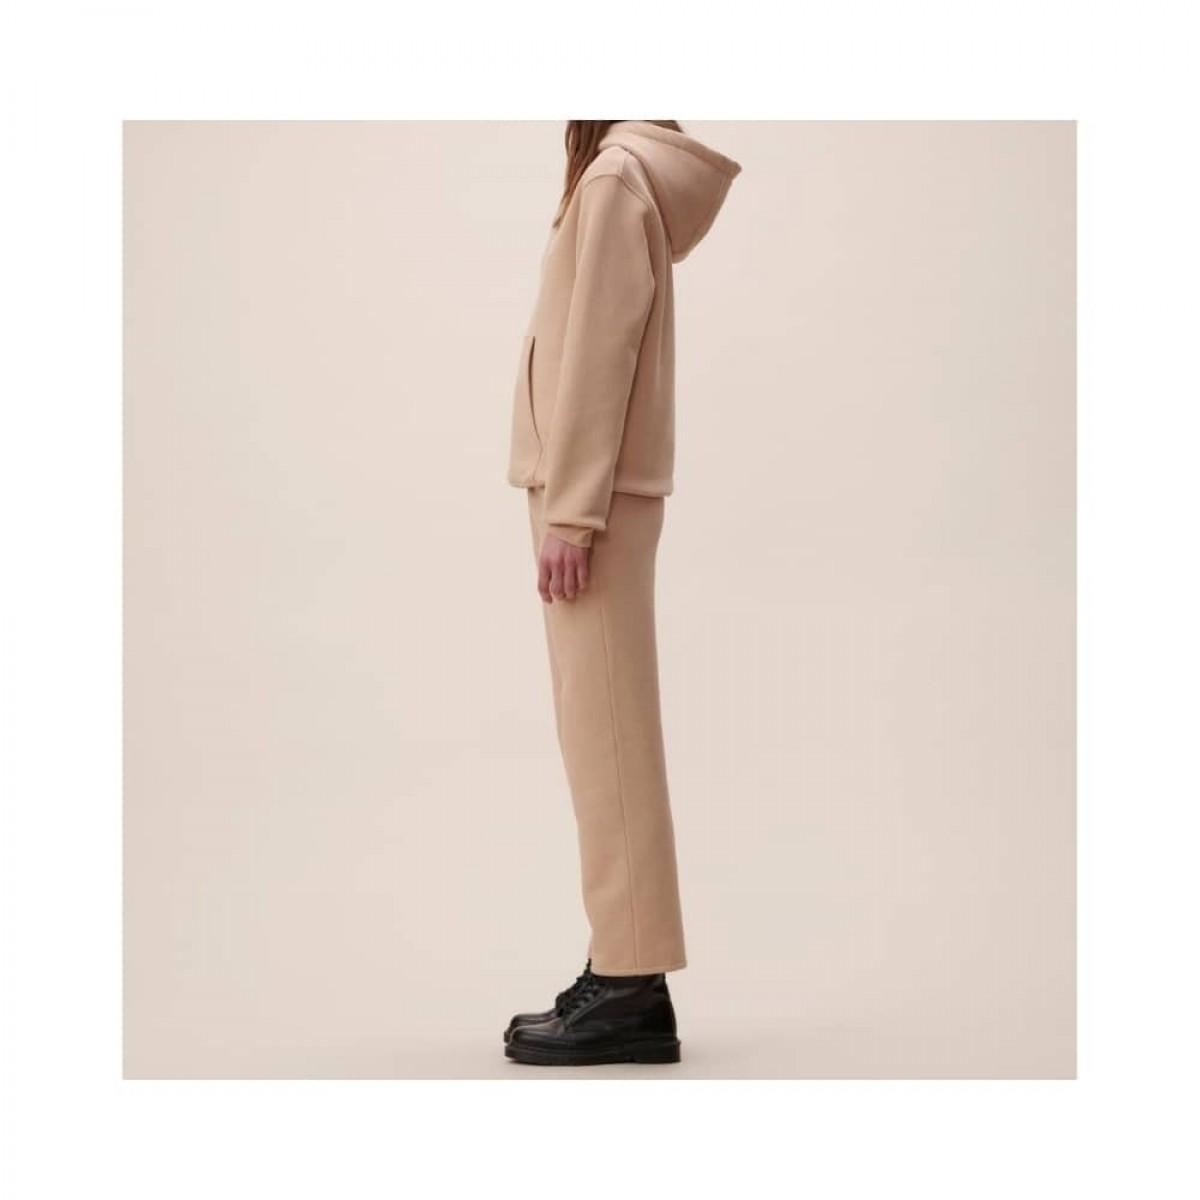 yetka sweat bukser - nomad camel - model fra siden